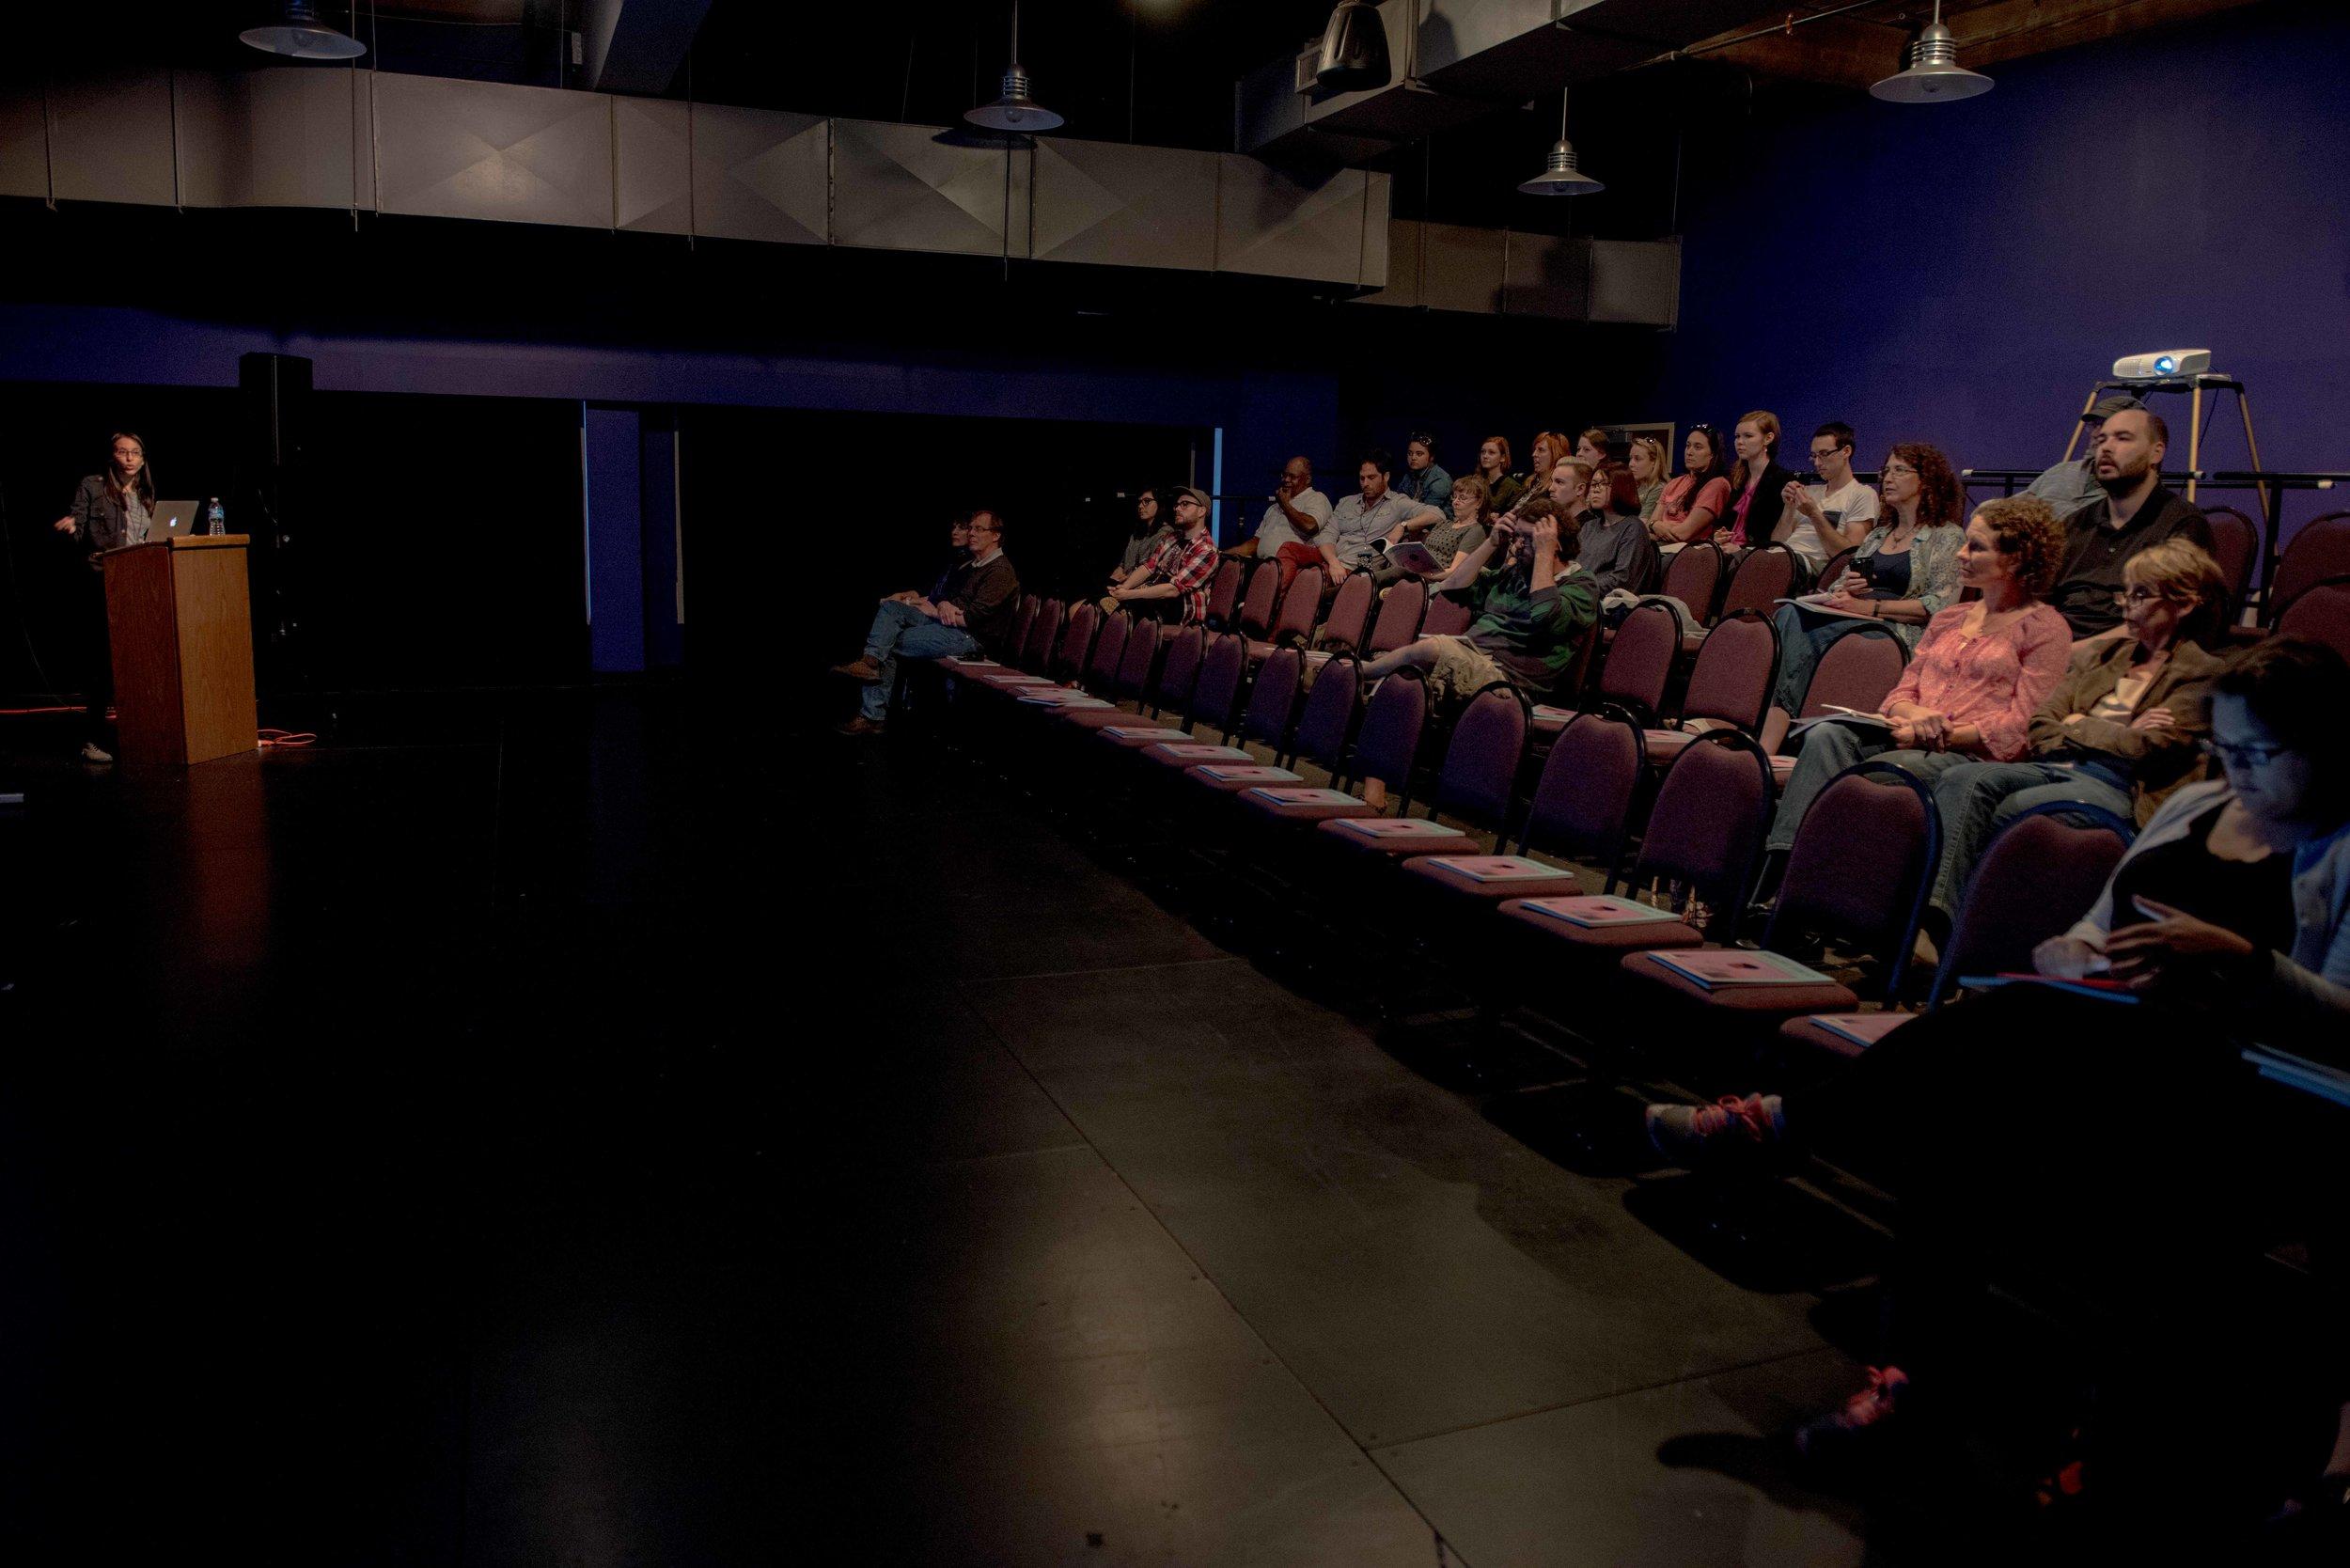 4-15 Seed&Spark-Crowdfunding Panel-audience-JennyViars-DancingLemurPhotography12.jpg